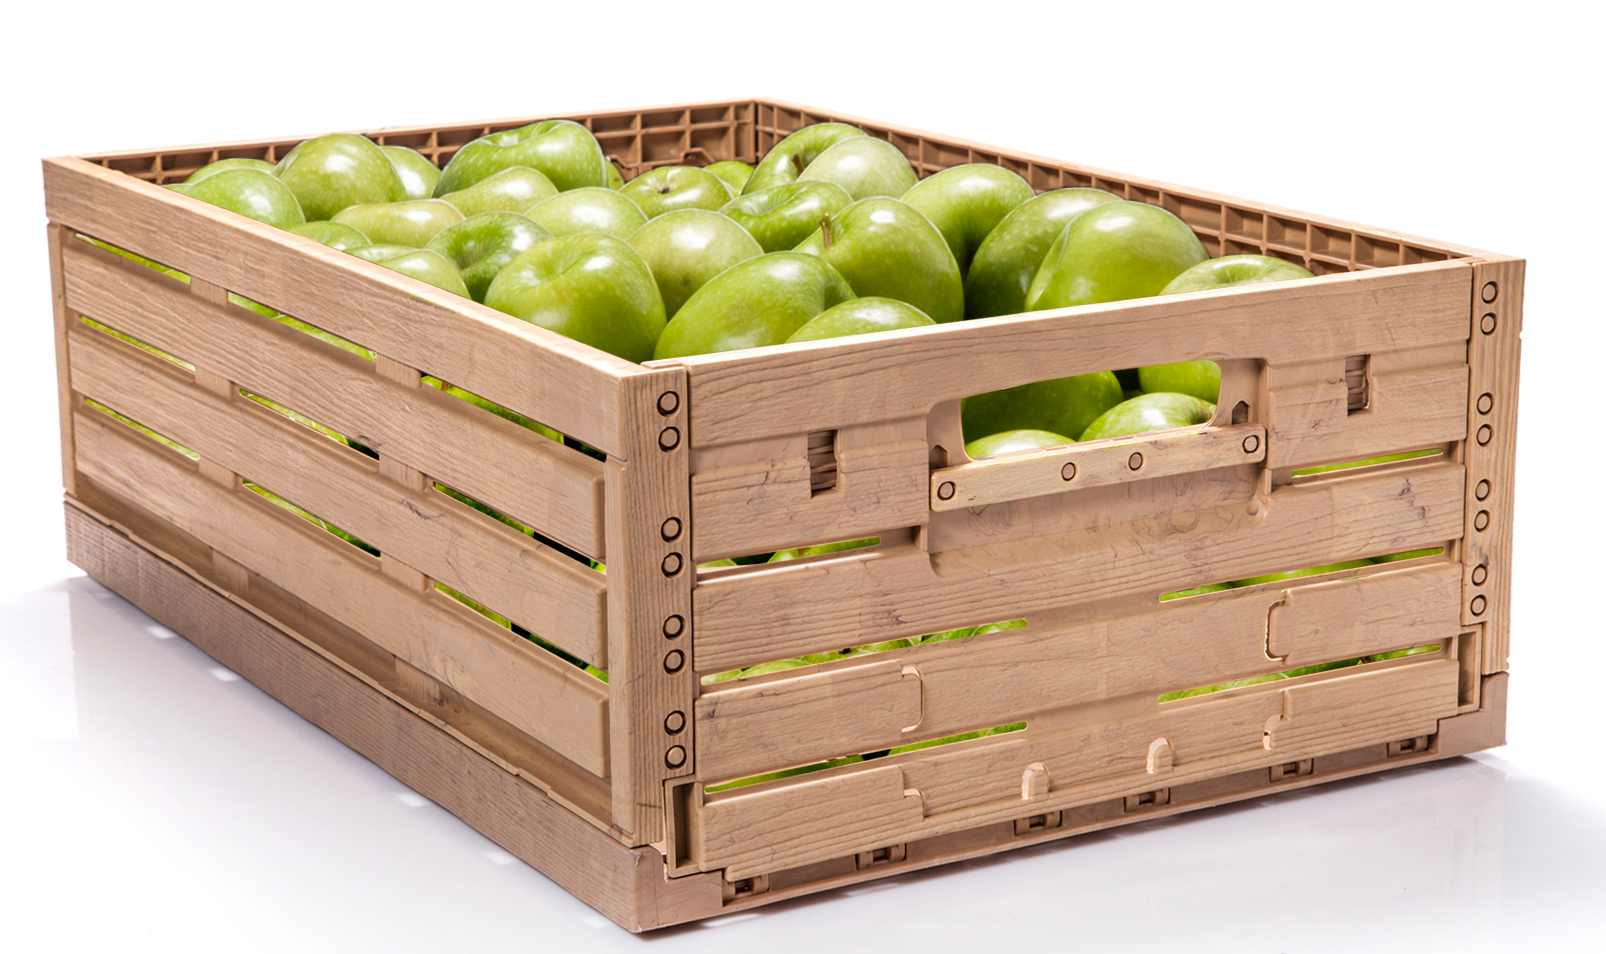 Le wood effect di polymer protagoniste a macfrut for Arredamento ortofrutta in legno